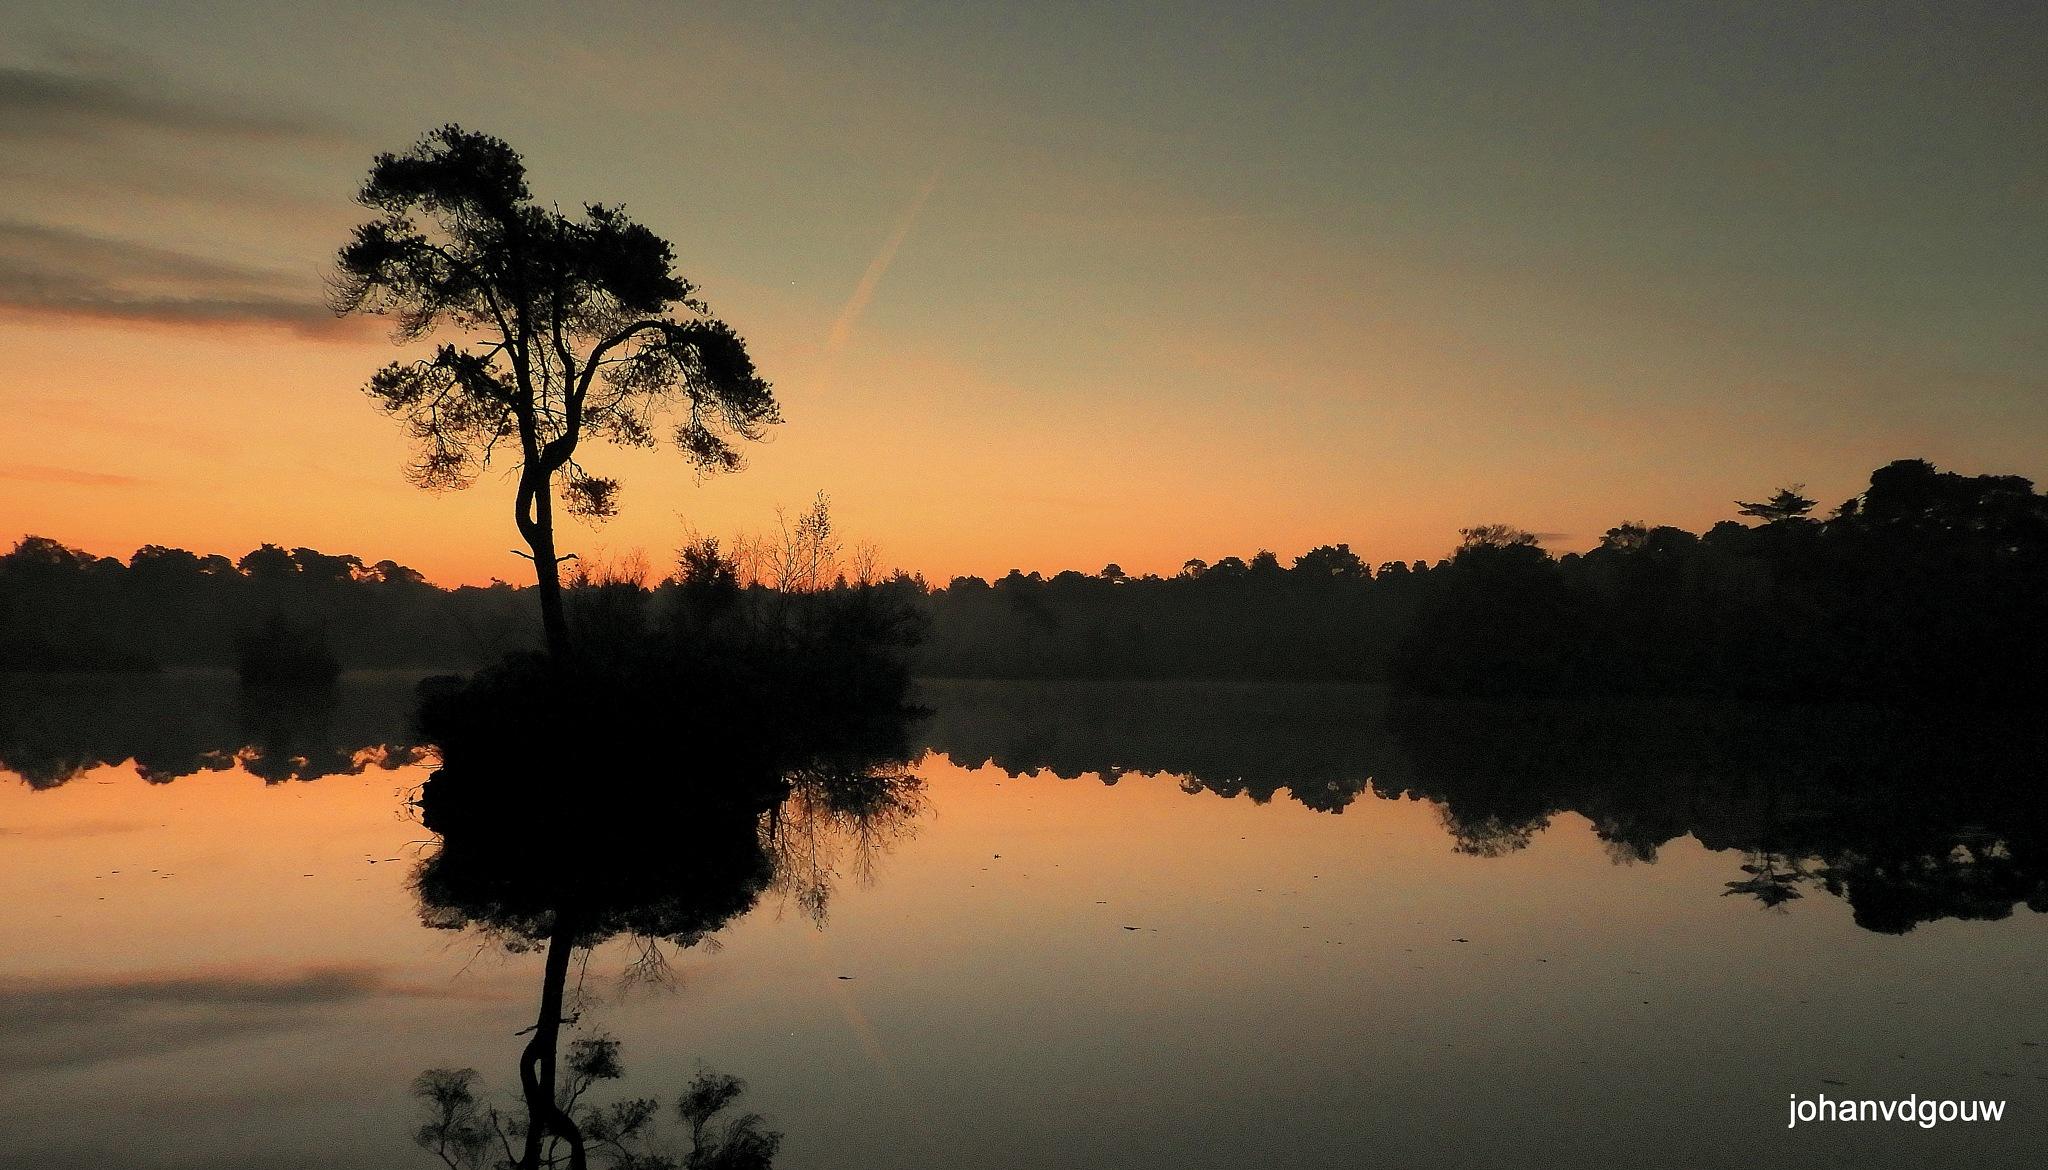 sunrise by johan.vandergouw